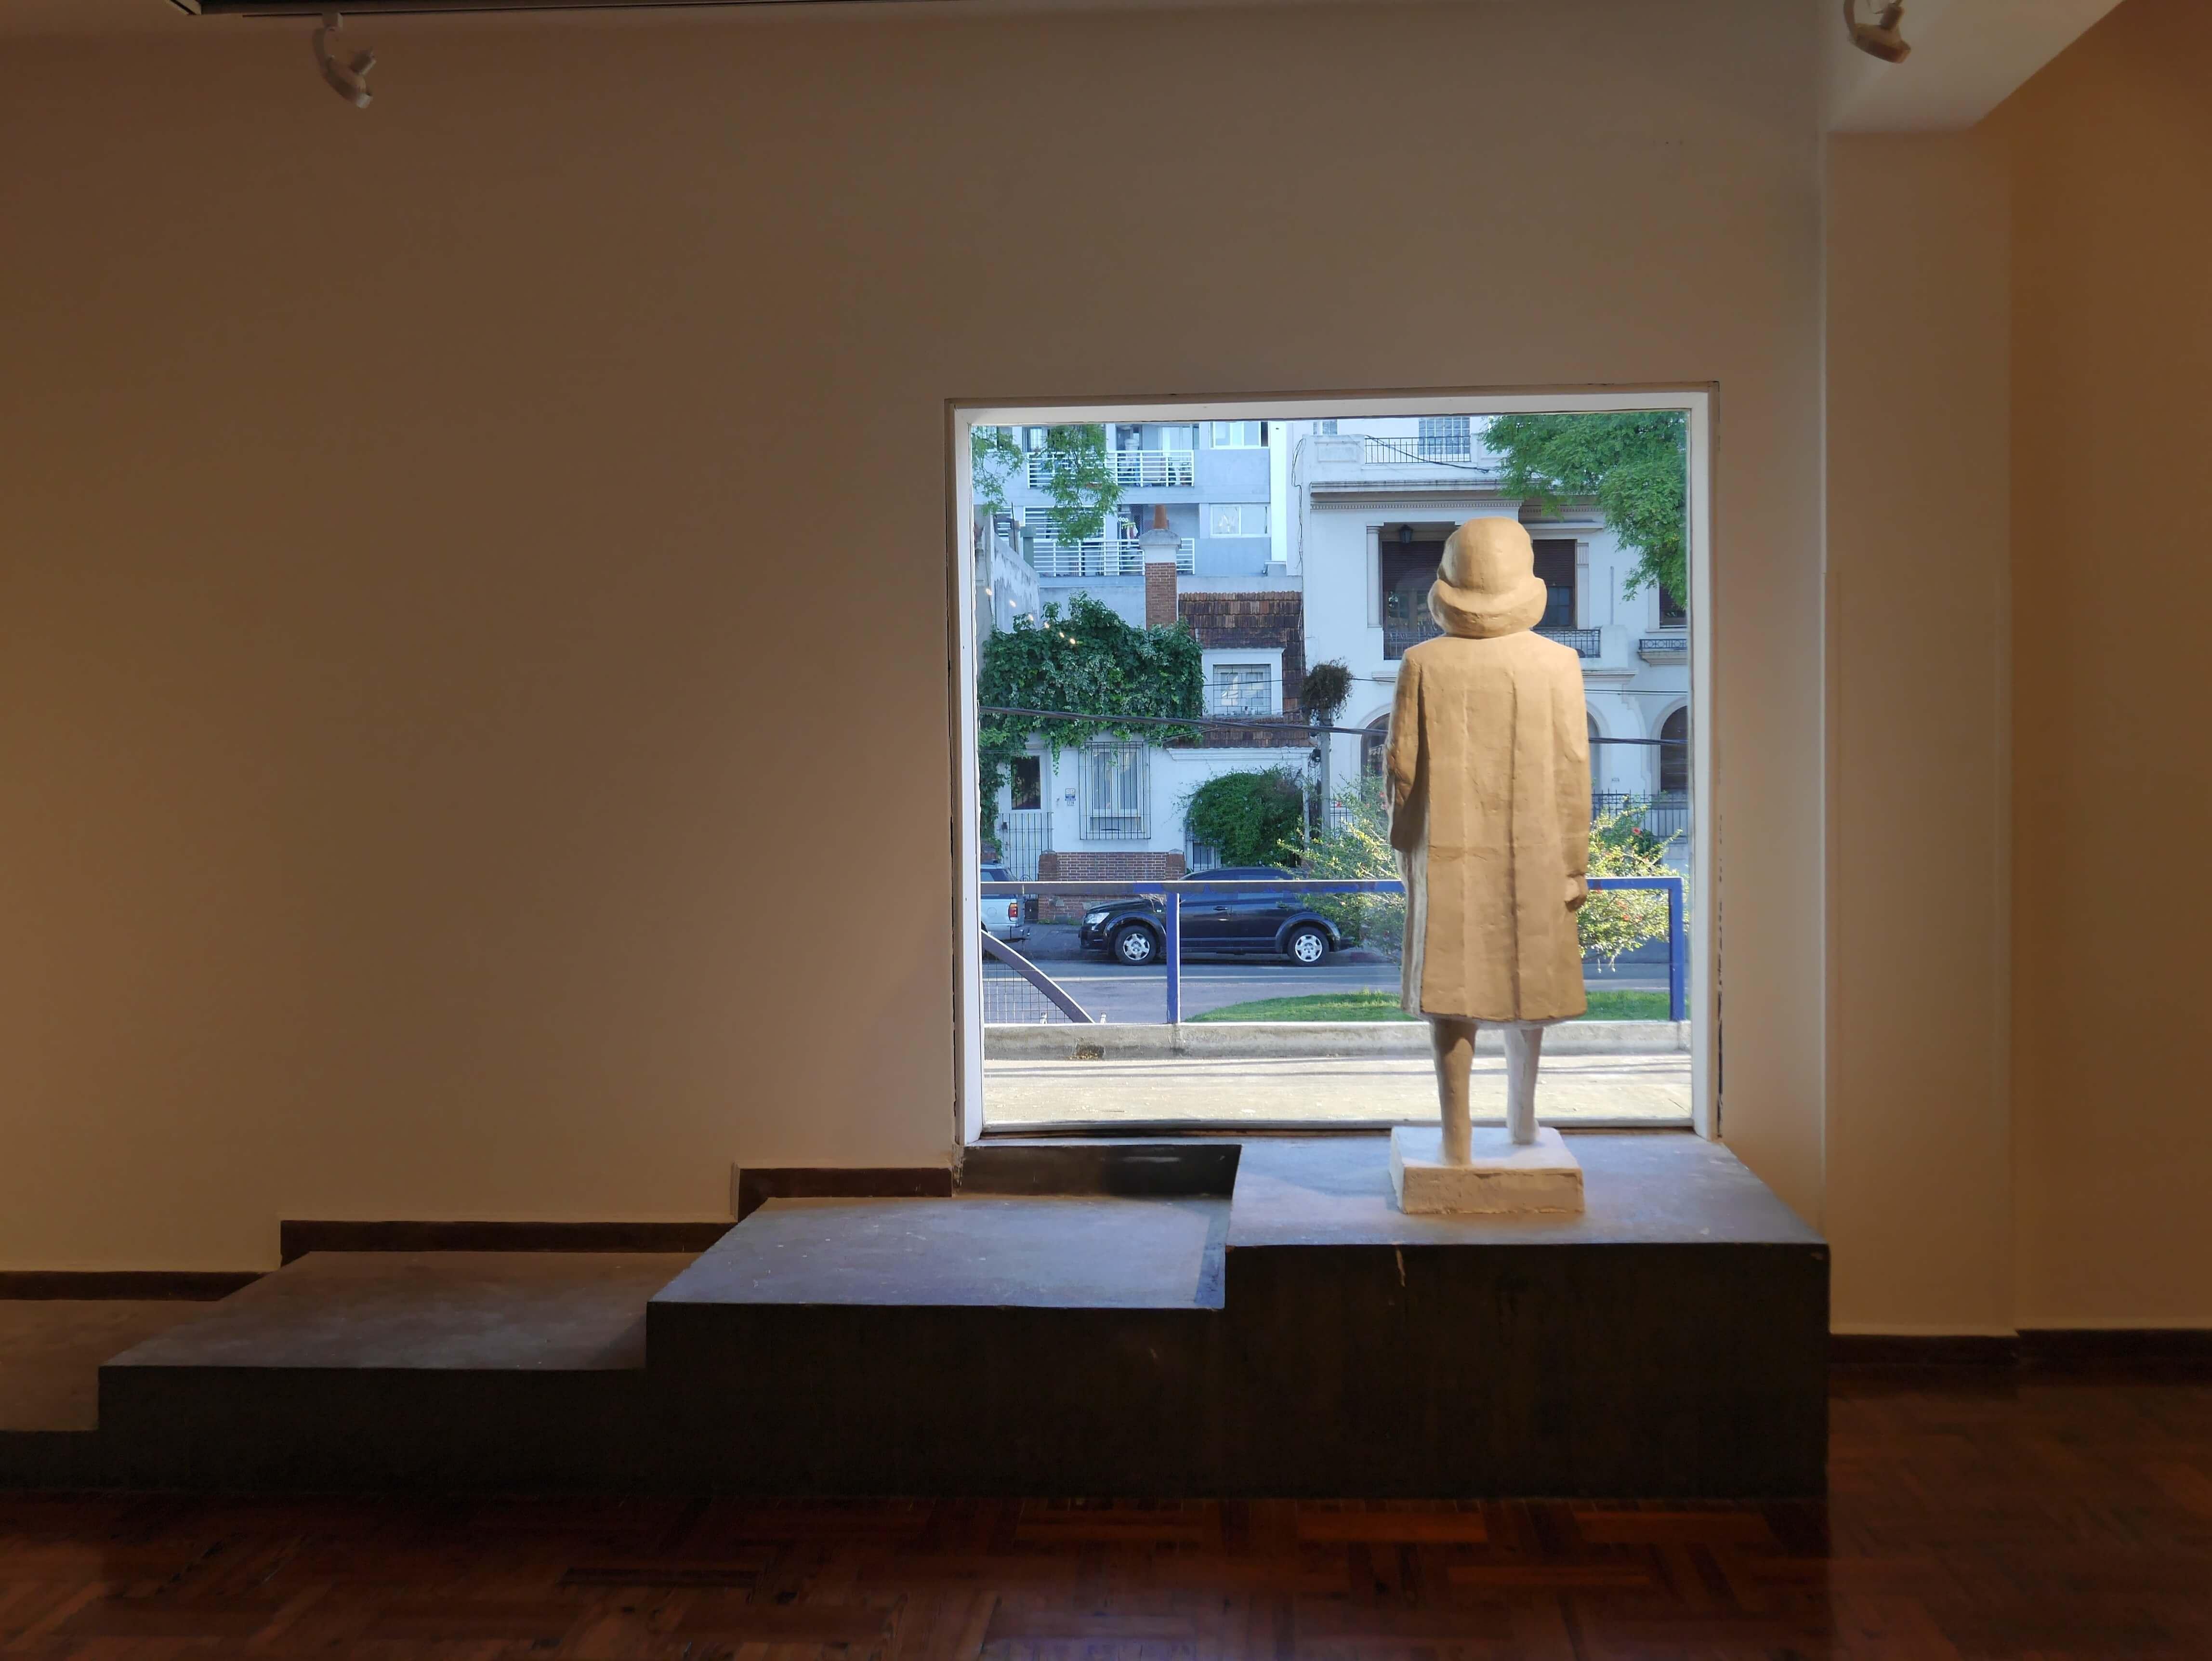 Museo-Nacional-Artes-Visuales-Montevideo-Uruguay-estatua-niña-ventana